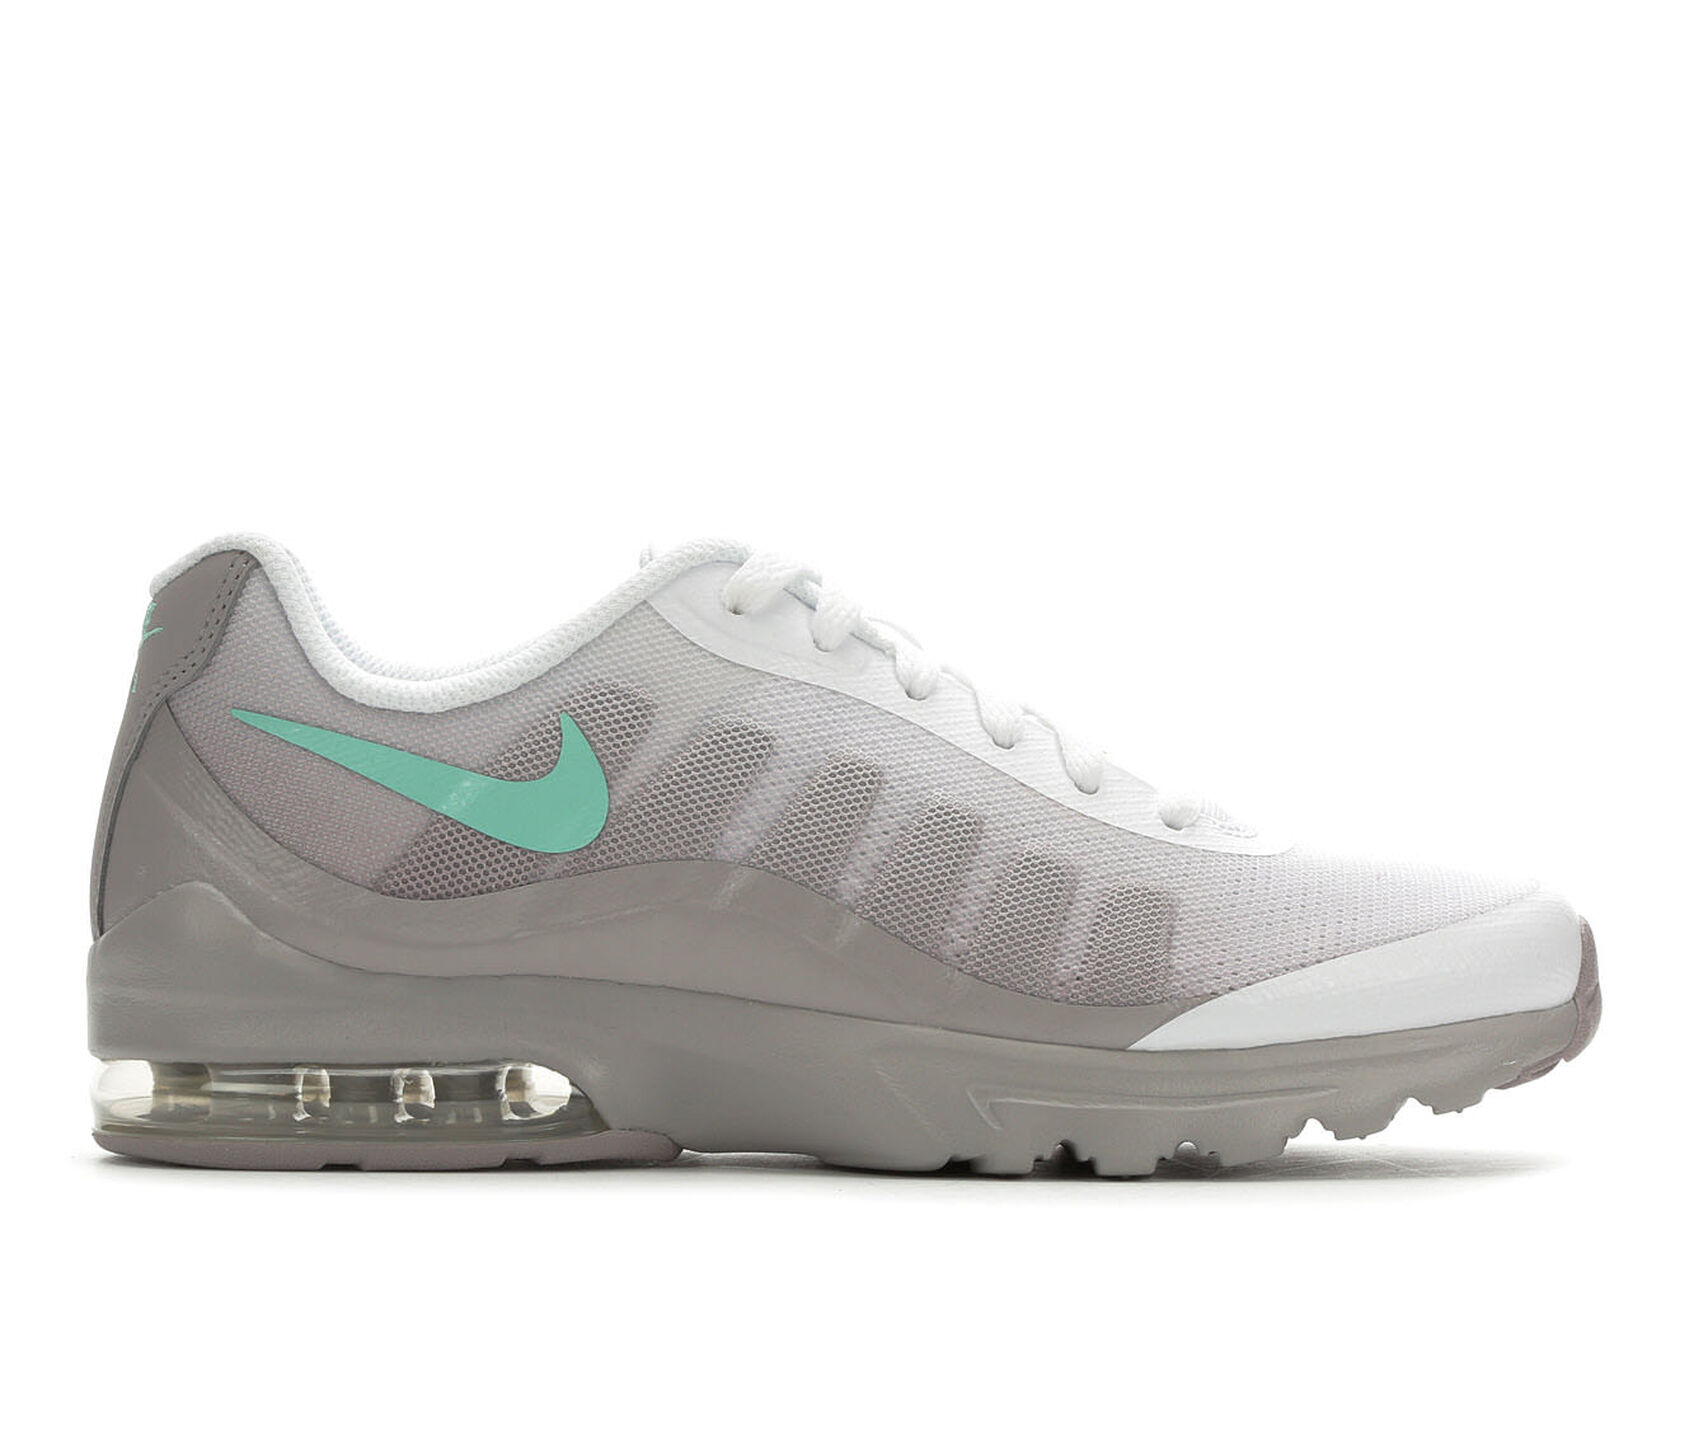 ... Nike Air Max Invigor Print Athletic Sneakers. Carousel Controls eba48fd47